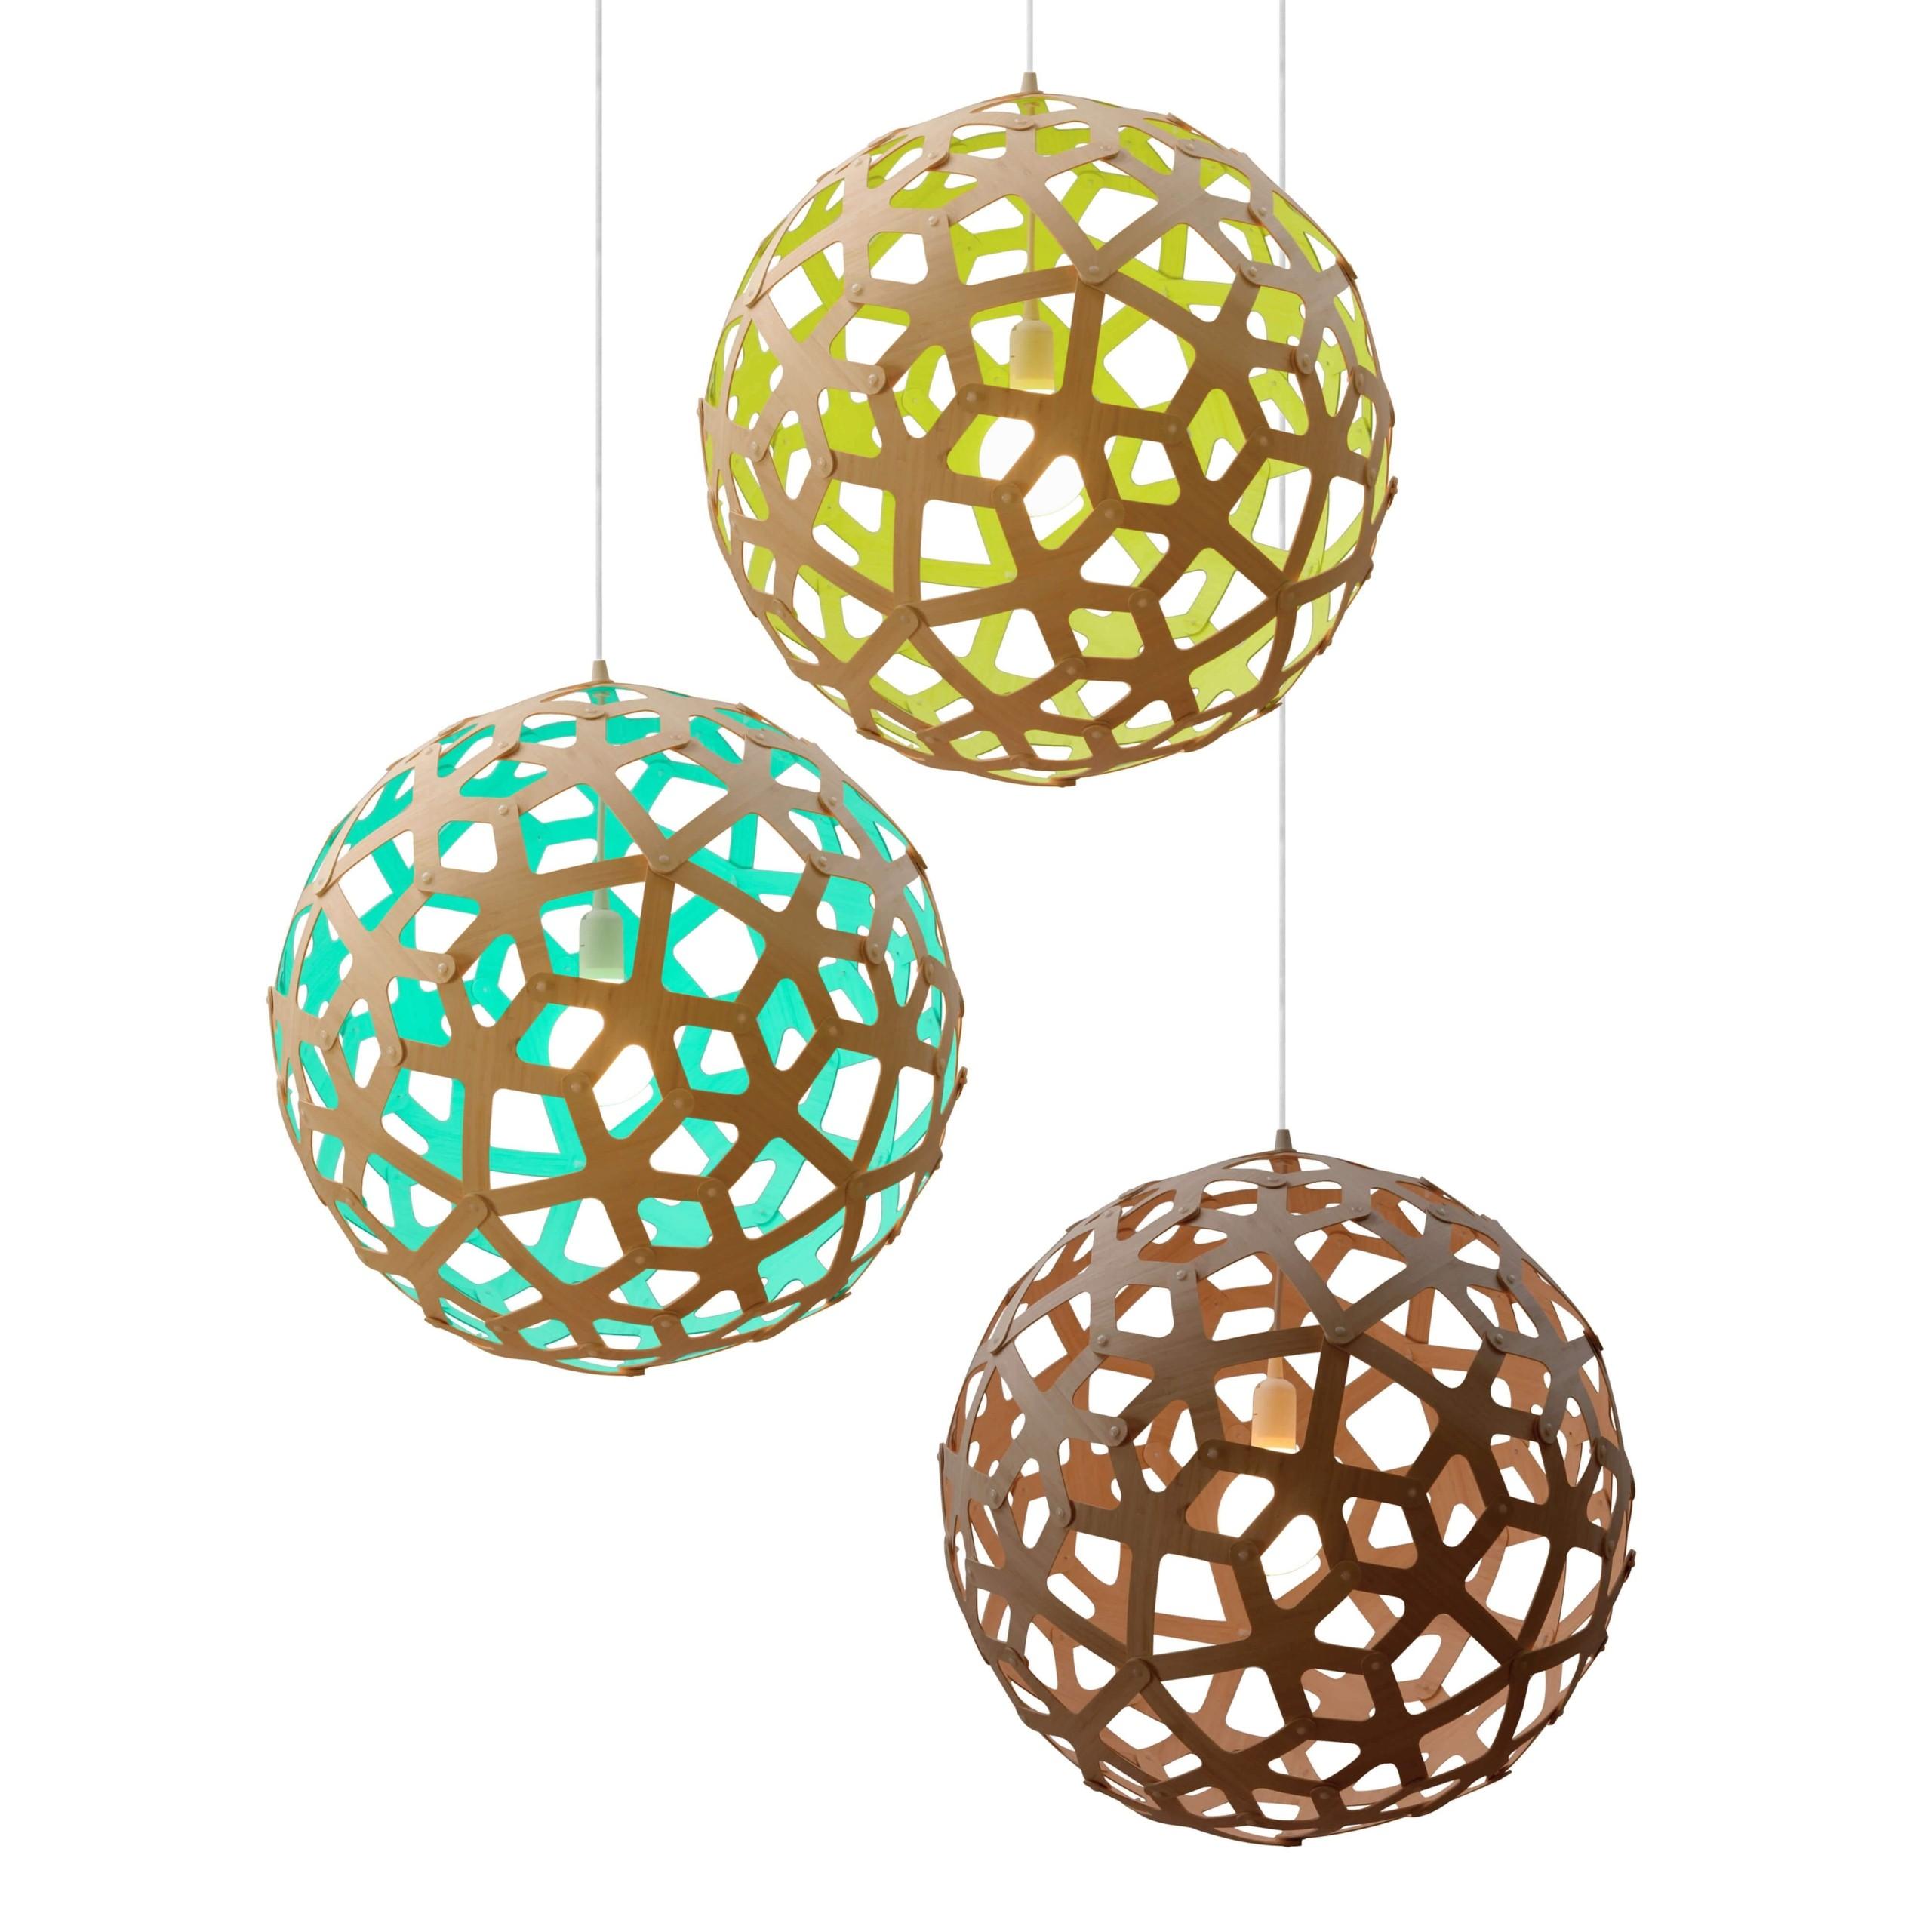 Modern Bamboo Coral Globe Ceiling Light Pendant Lamp Fixture Lighting